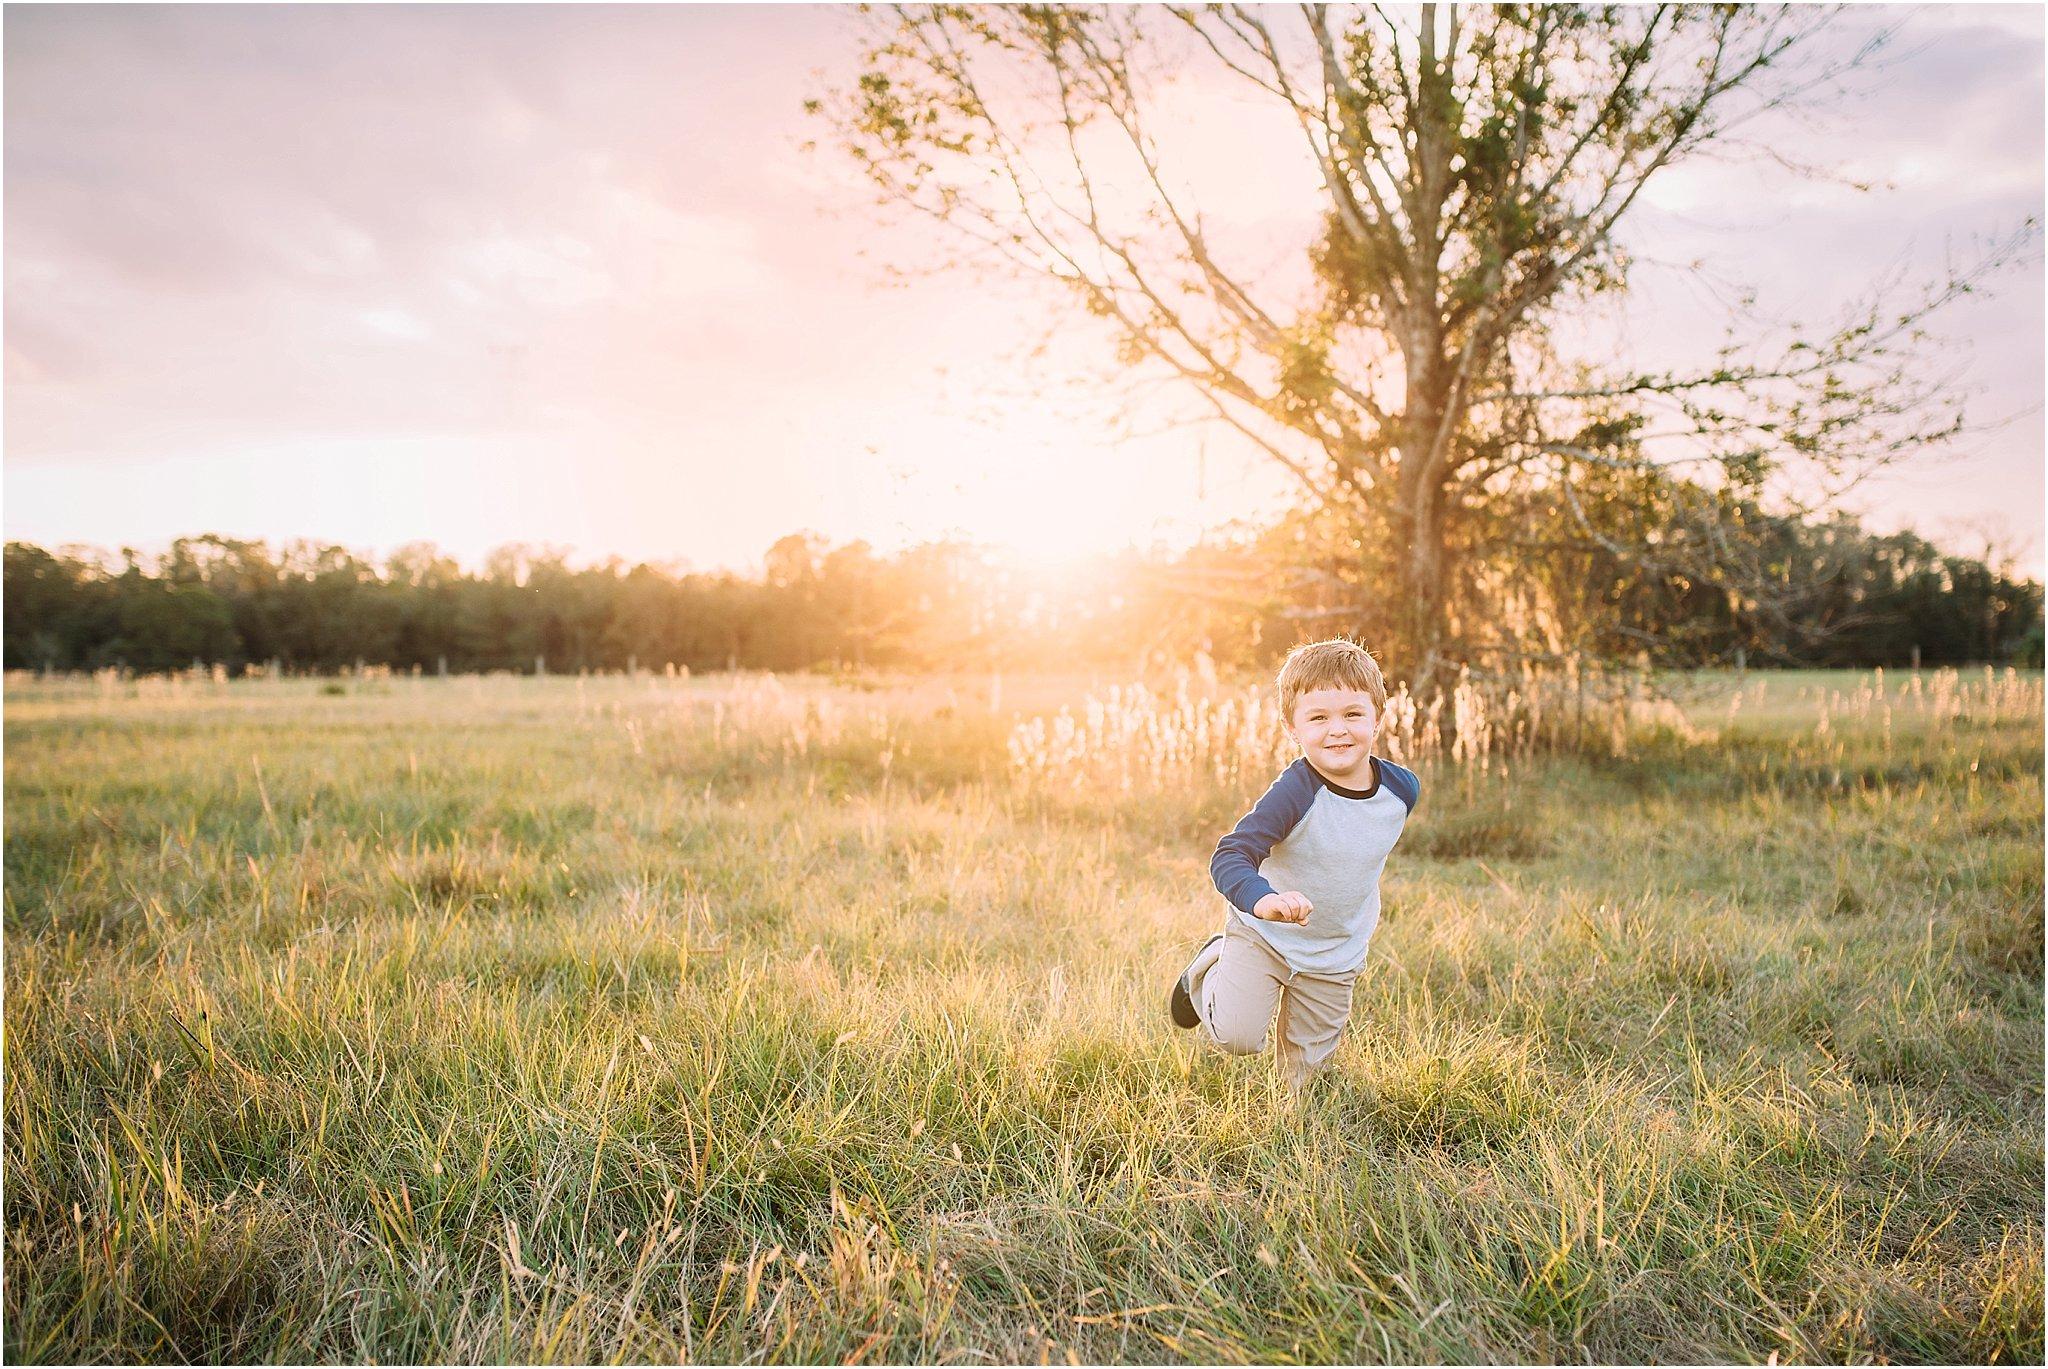 Ashley_Rogers_Photography_Orlando_Non-Posed_Newborn_Family_Lifestyle_Photographer_0236.jpg